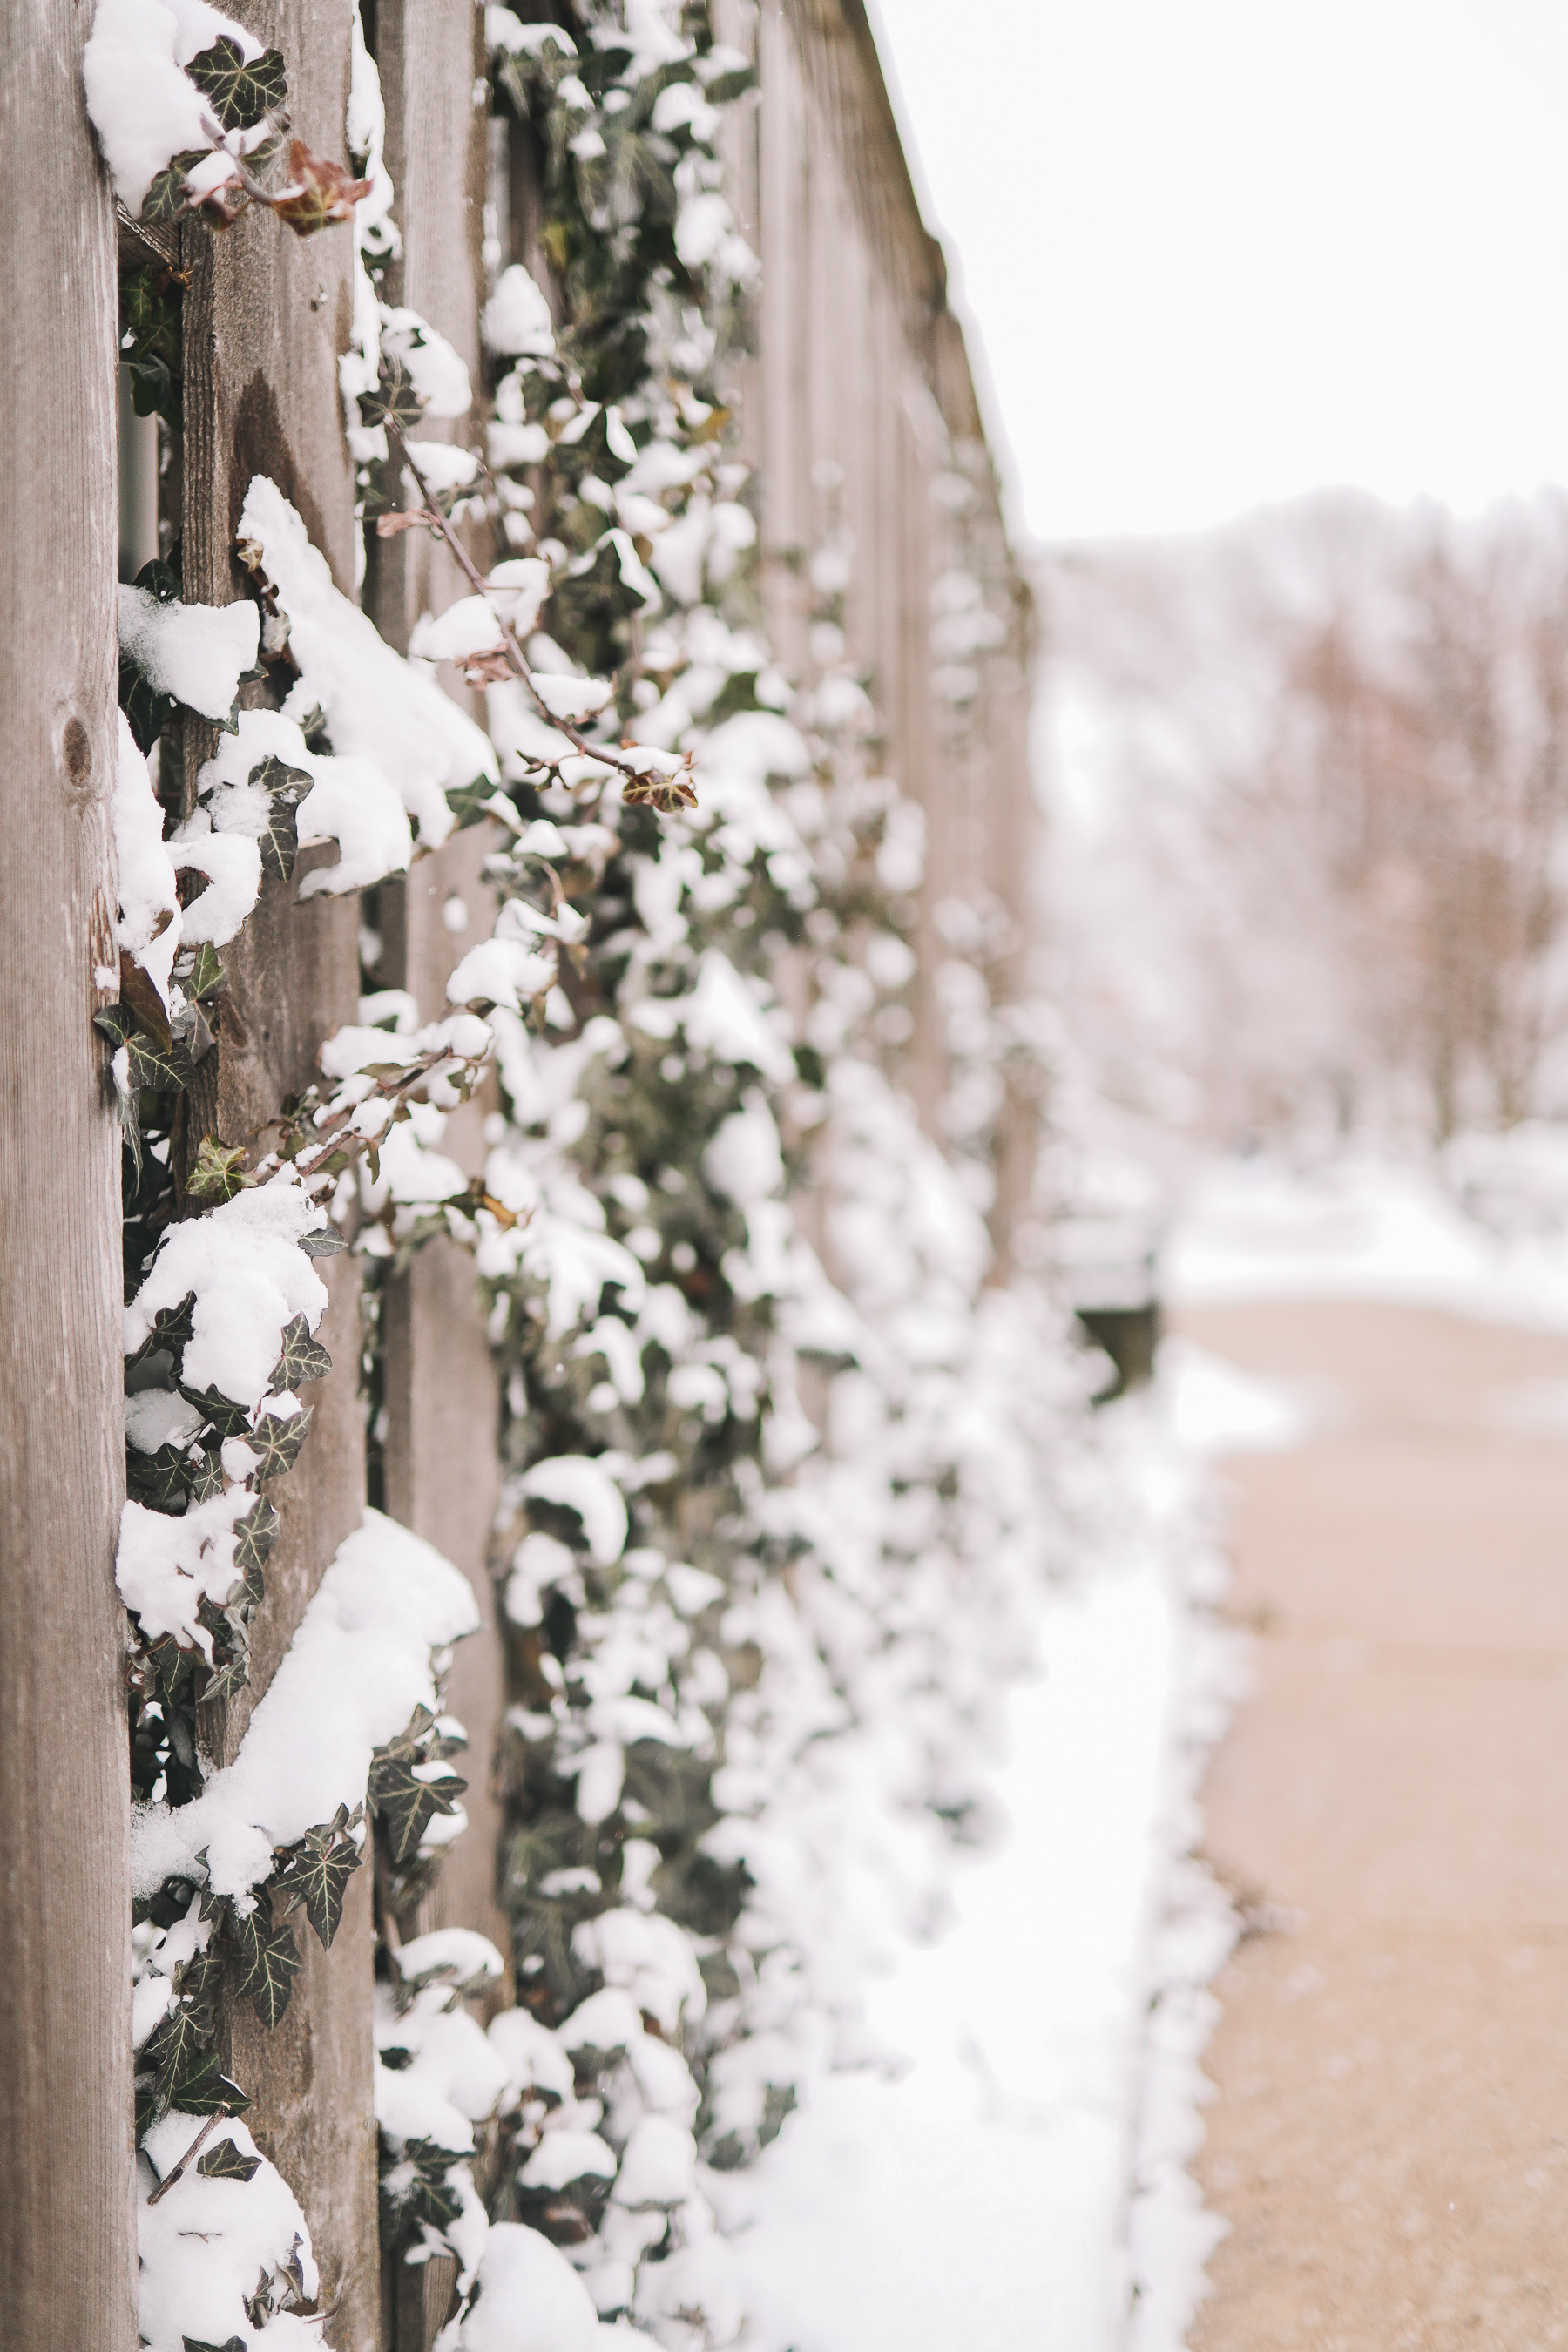 frozen chicago streets